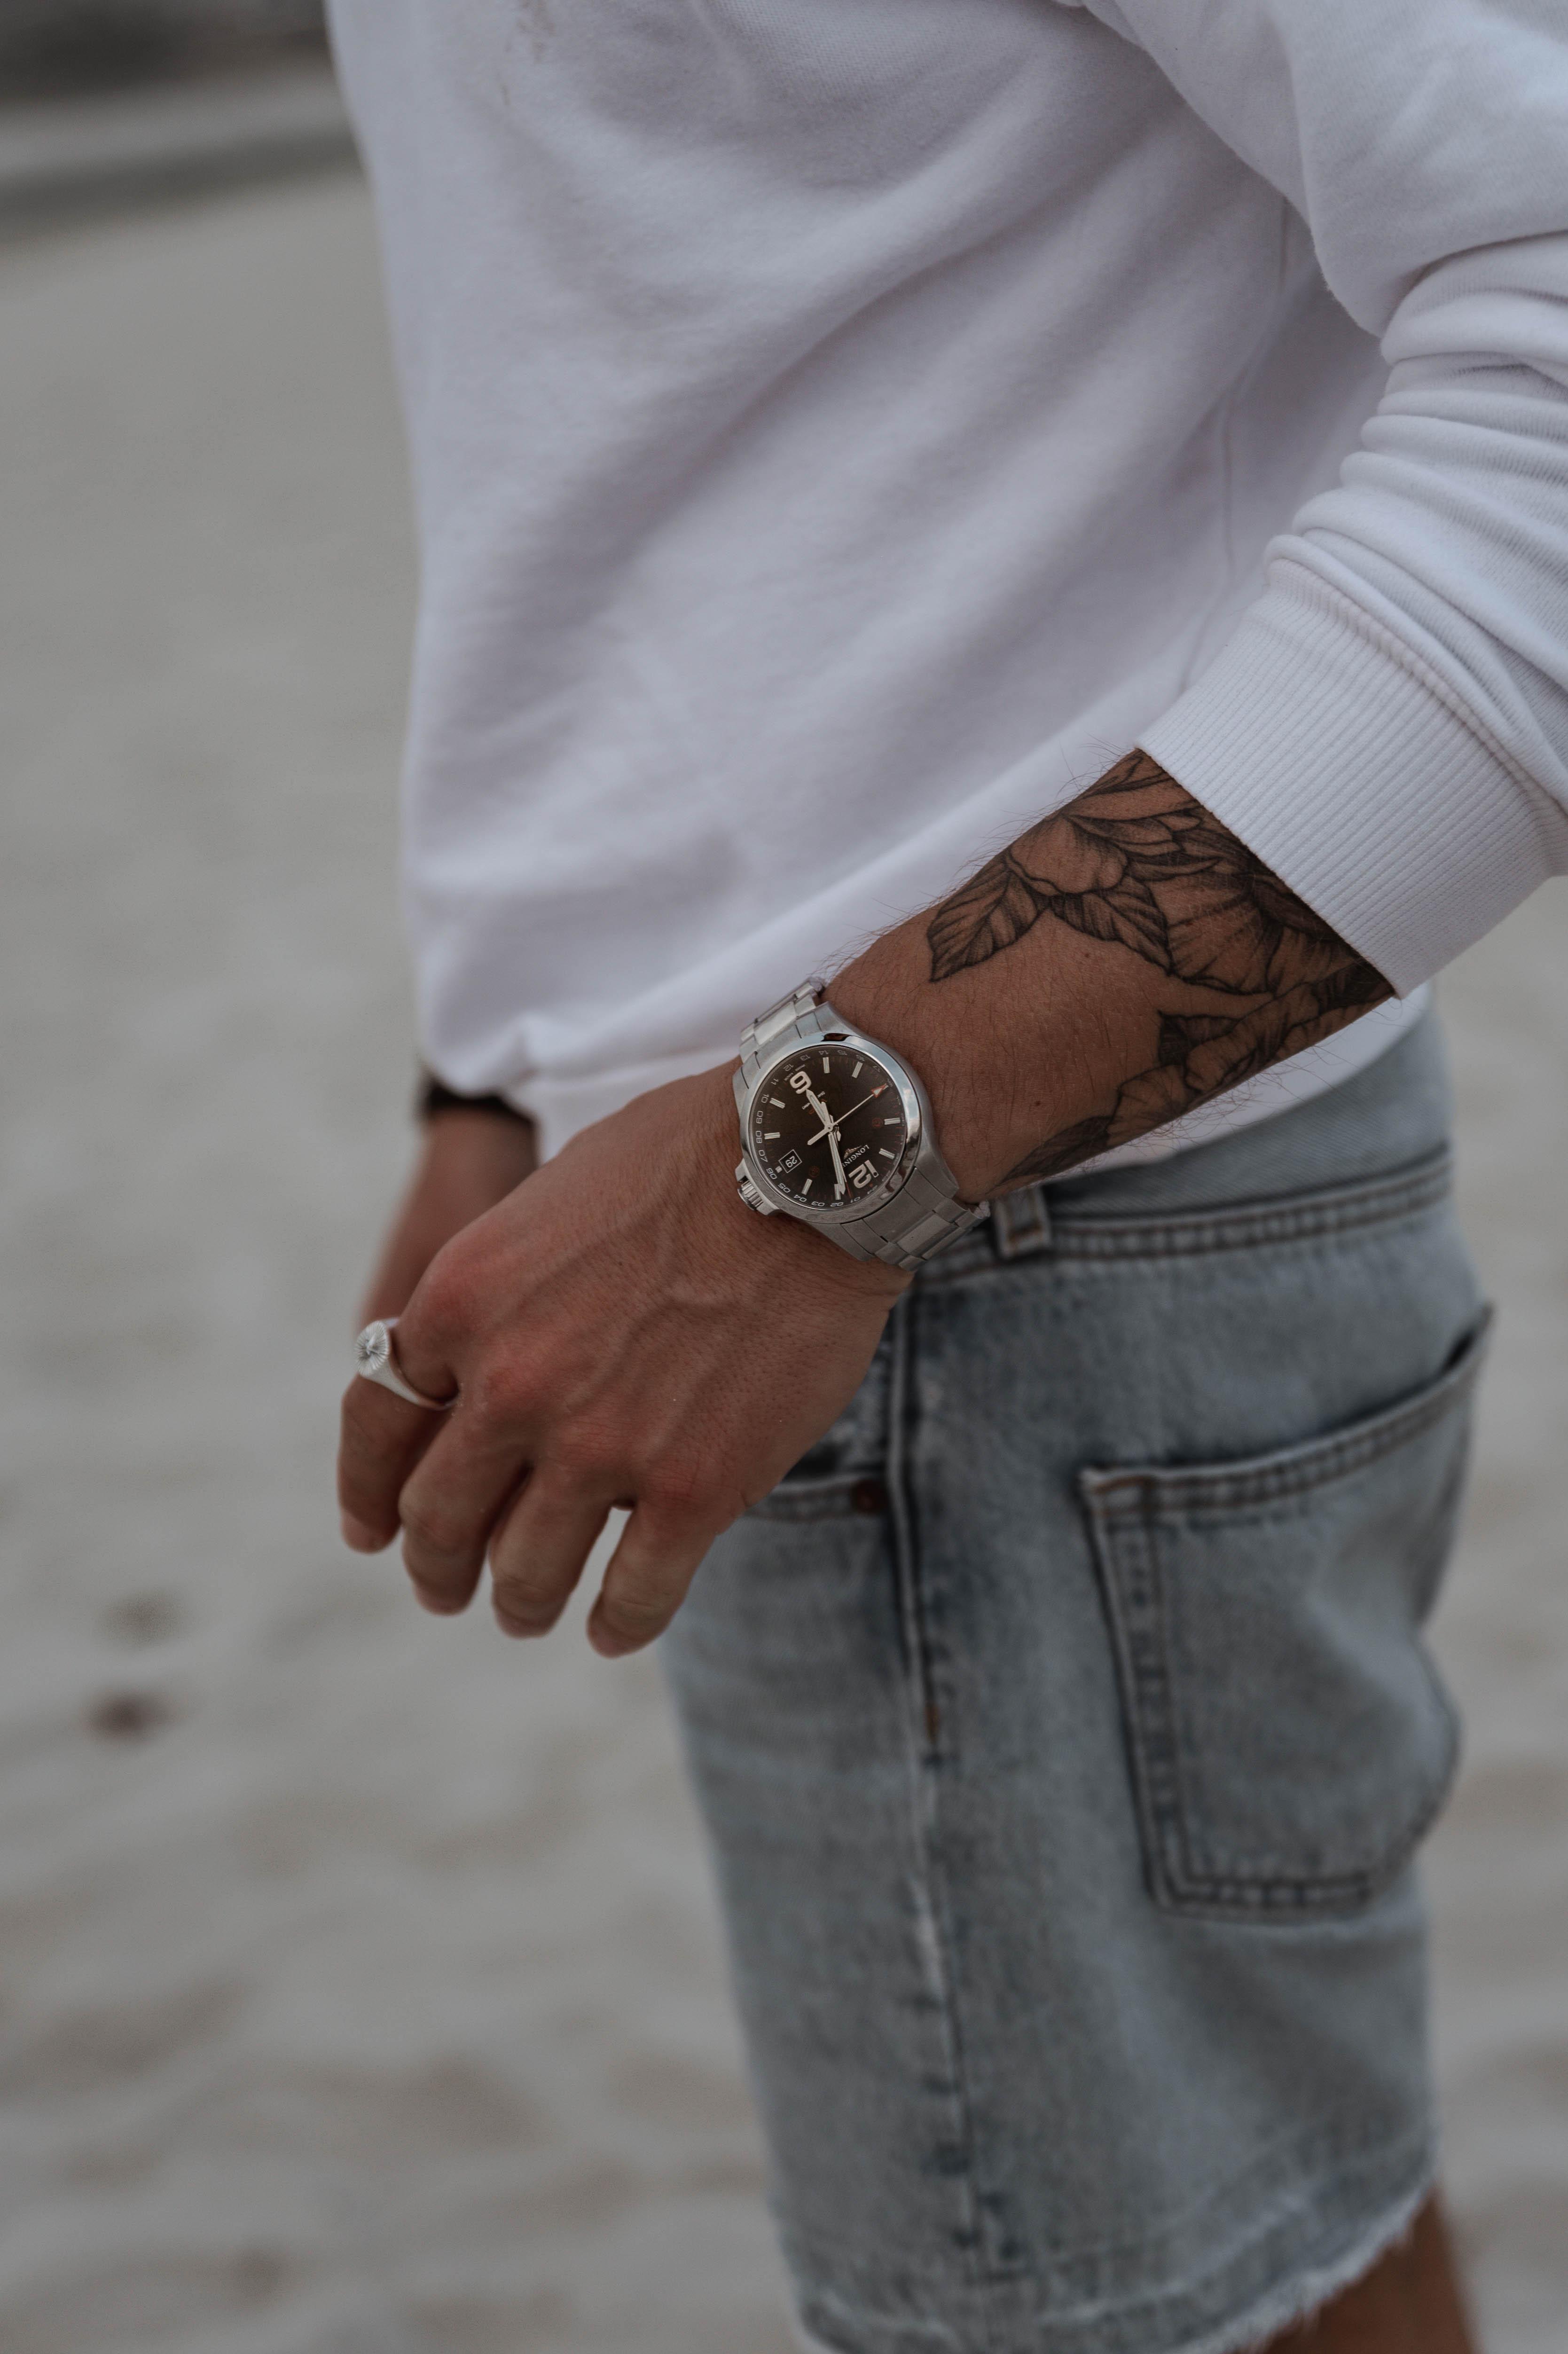 Tommeezjerry-Lifestyleblog-Fashionblog-Maennermodeblog-Maennerblog-Modeblog-Longines-Conquest-VHP-GMT-Timepiece-Classy-Casual-Moderngentleman